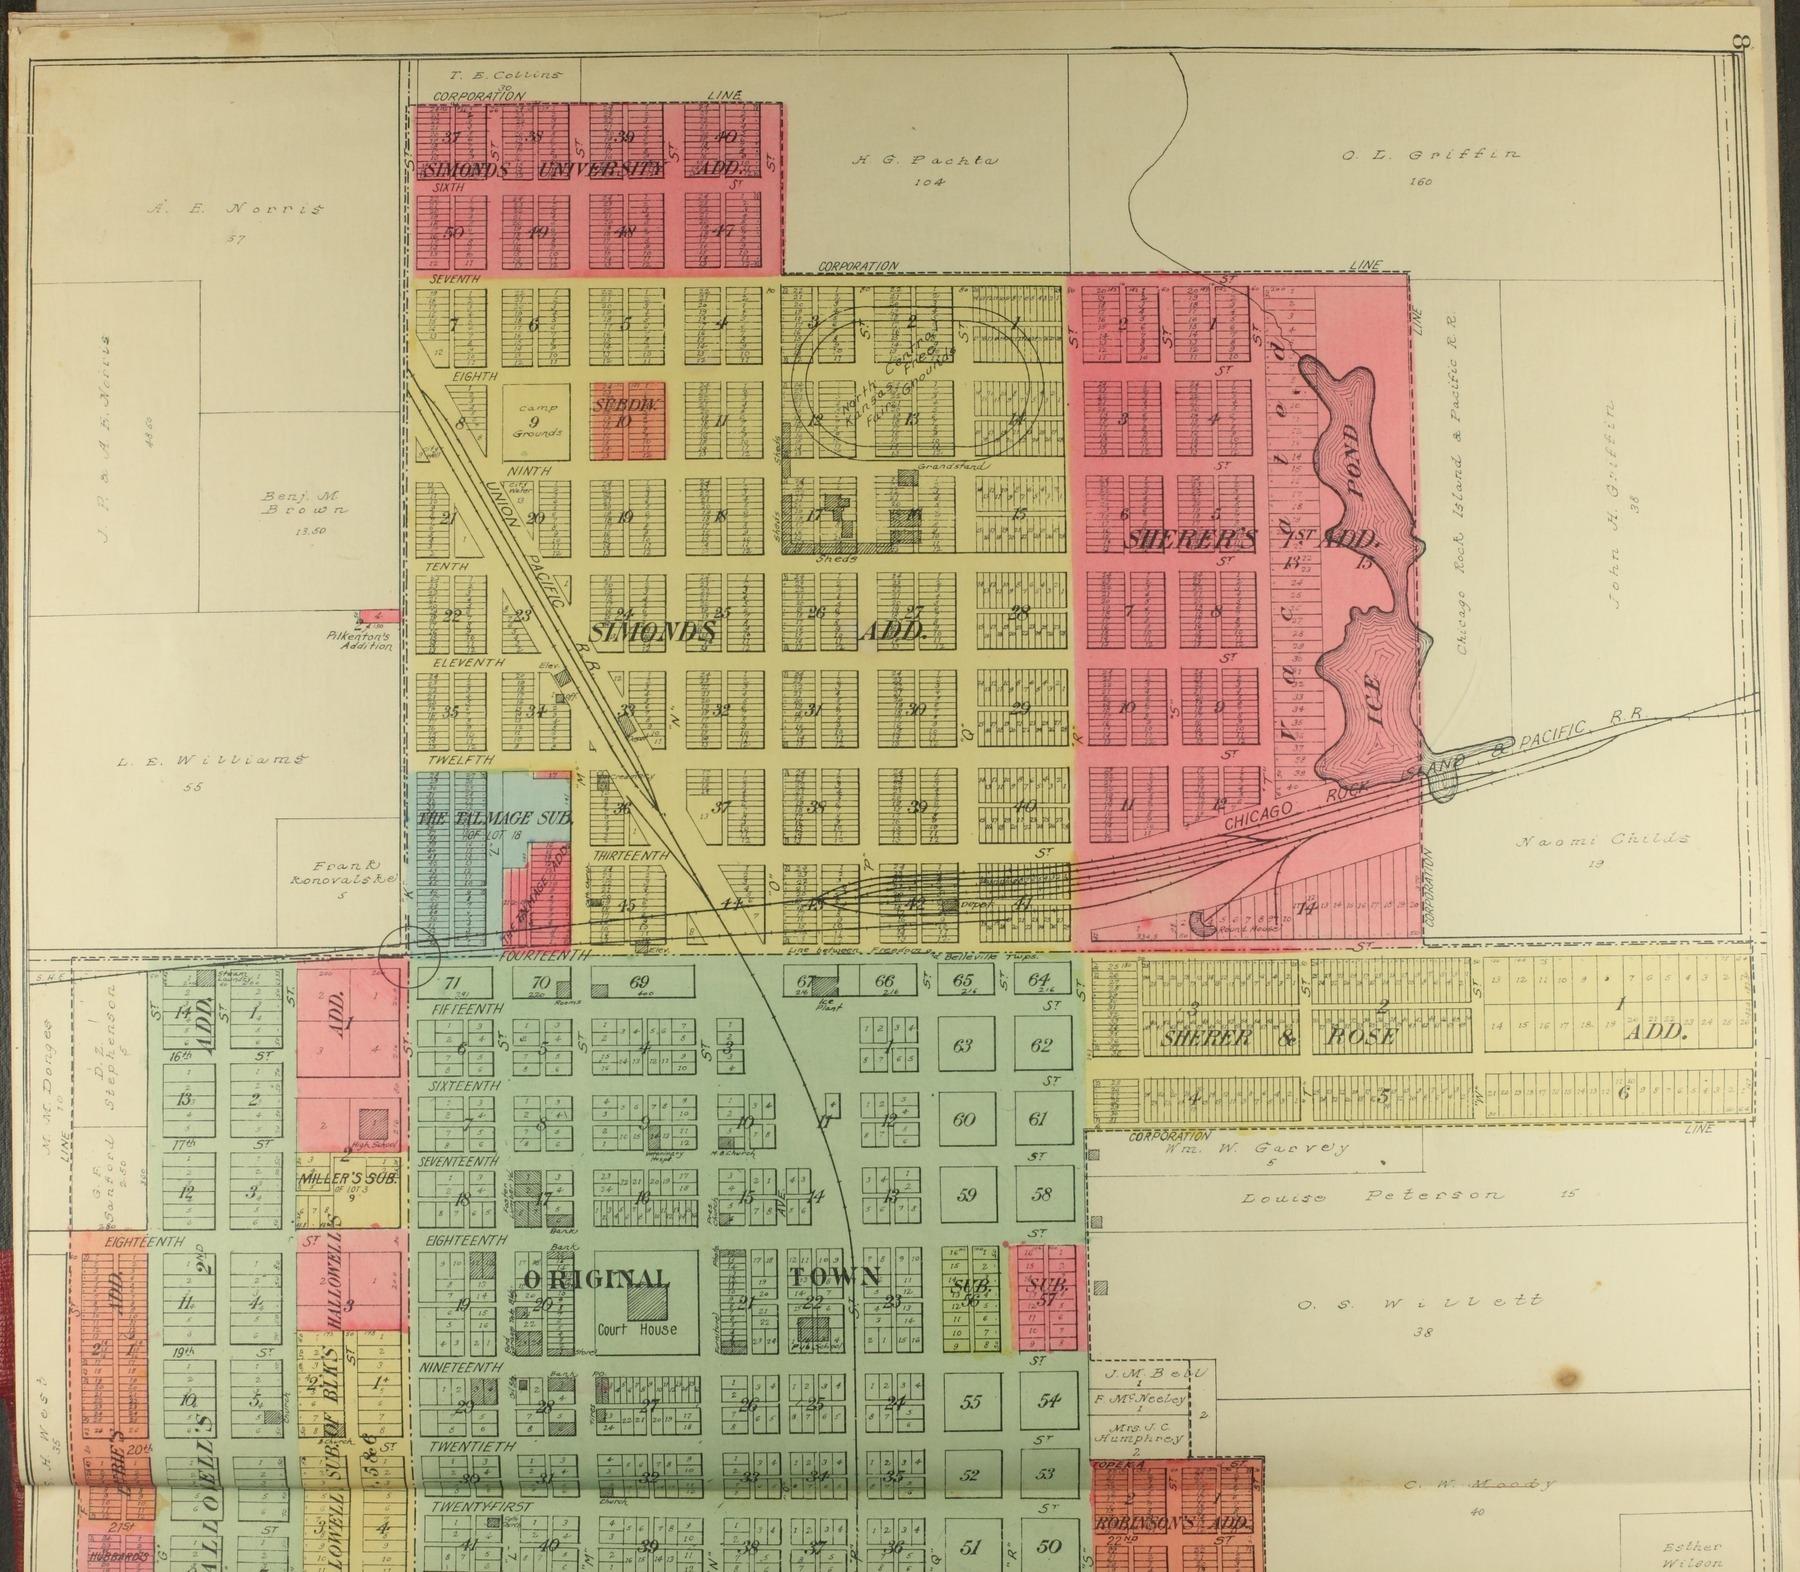 Standard atlas of Republic County, Kansas - 8